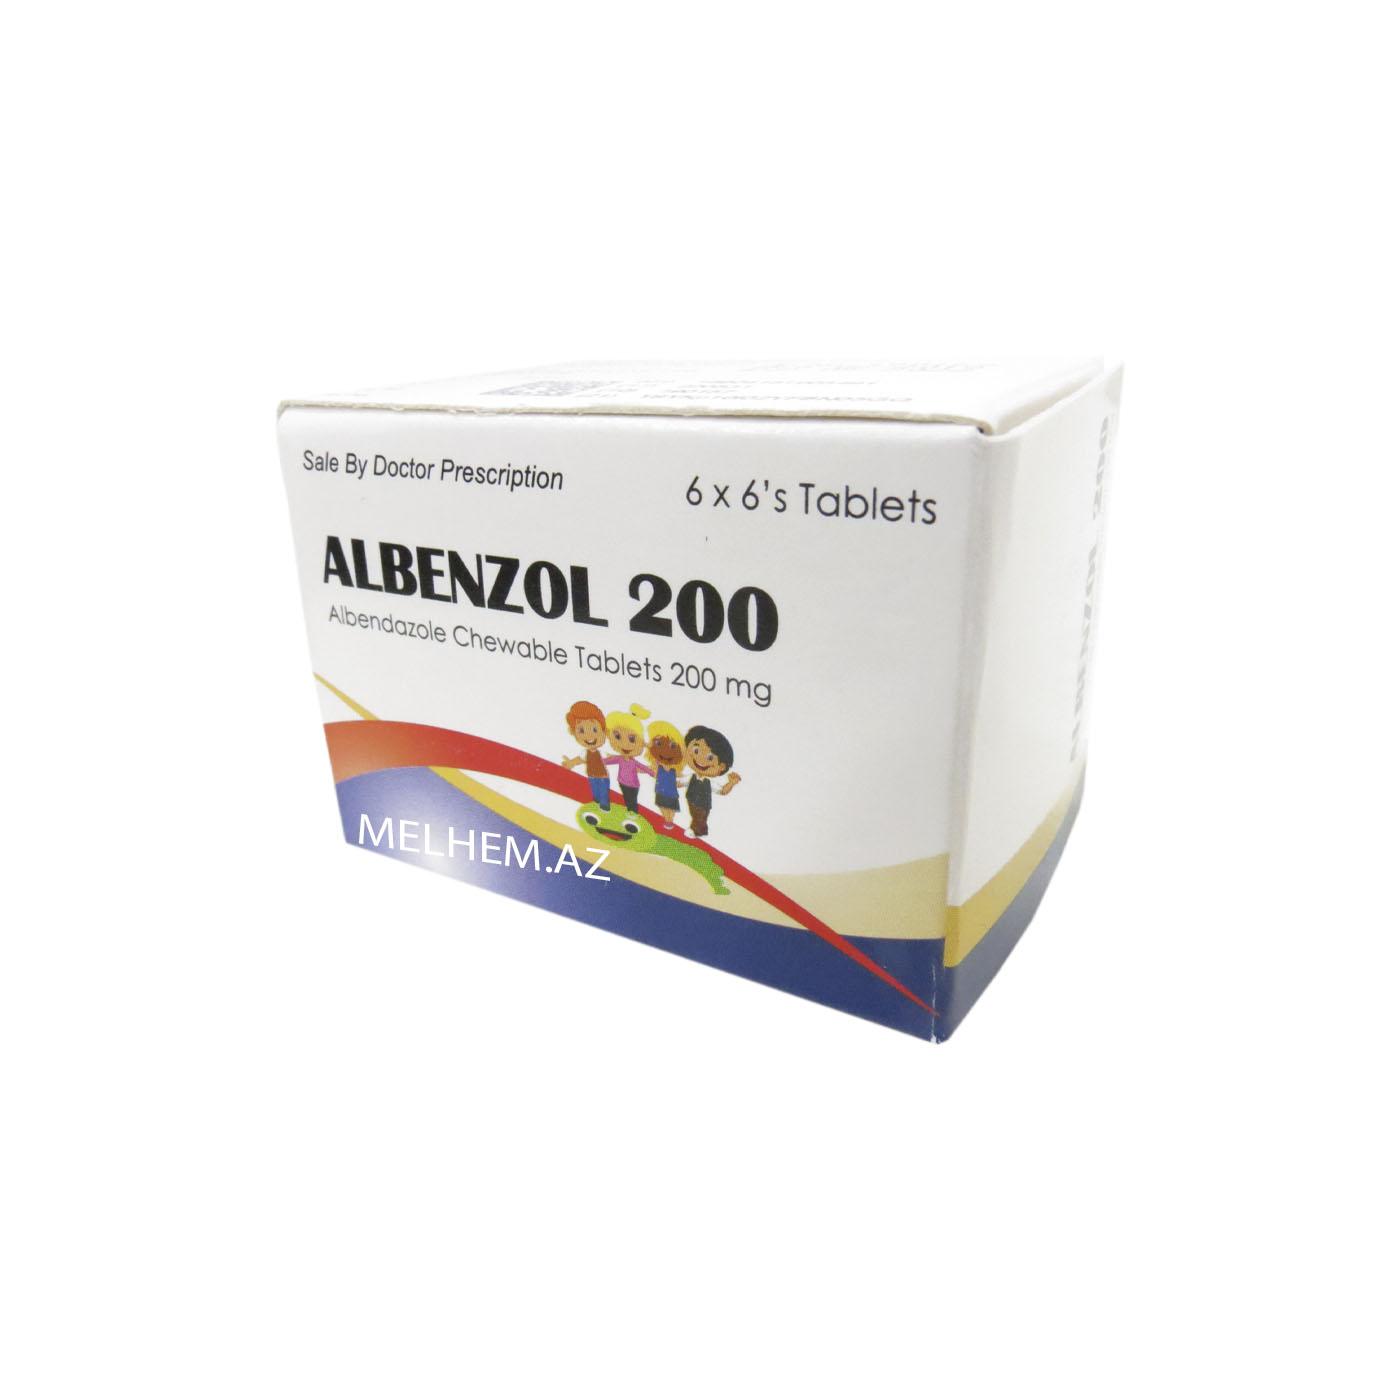 ALBENZOL 200 MQ N36